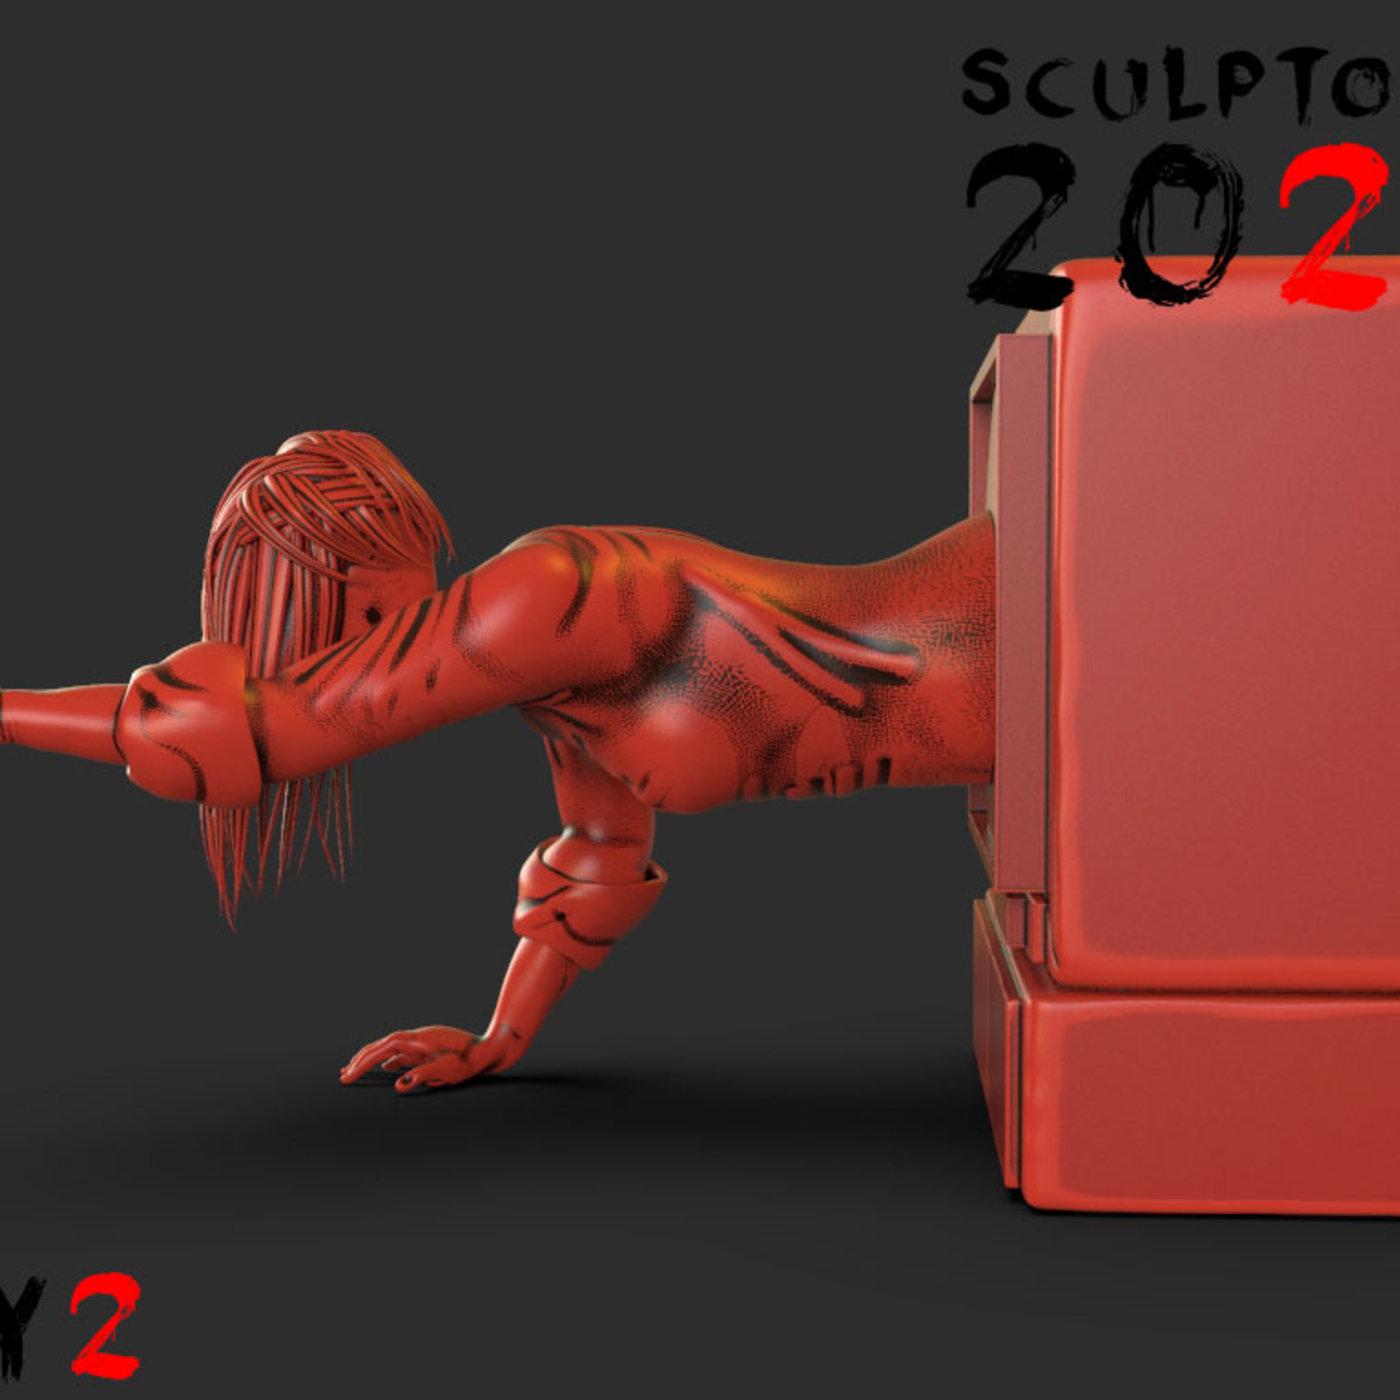 Sculptober Day 02 Sadako